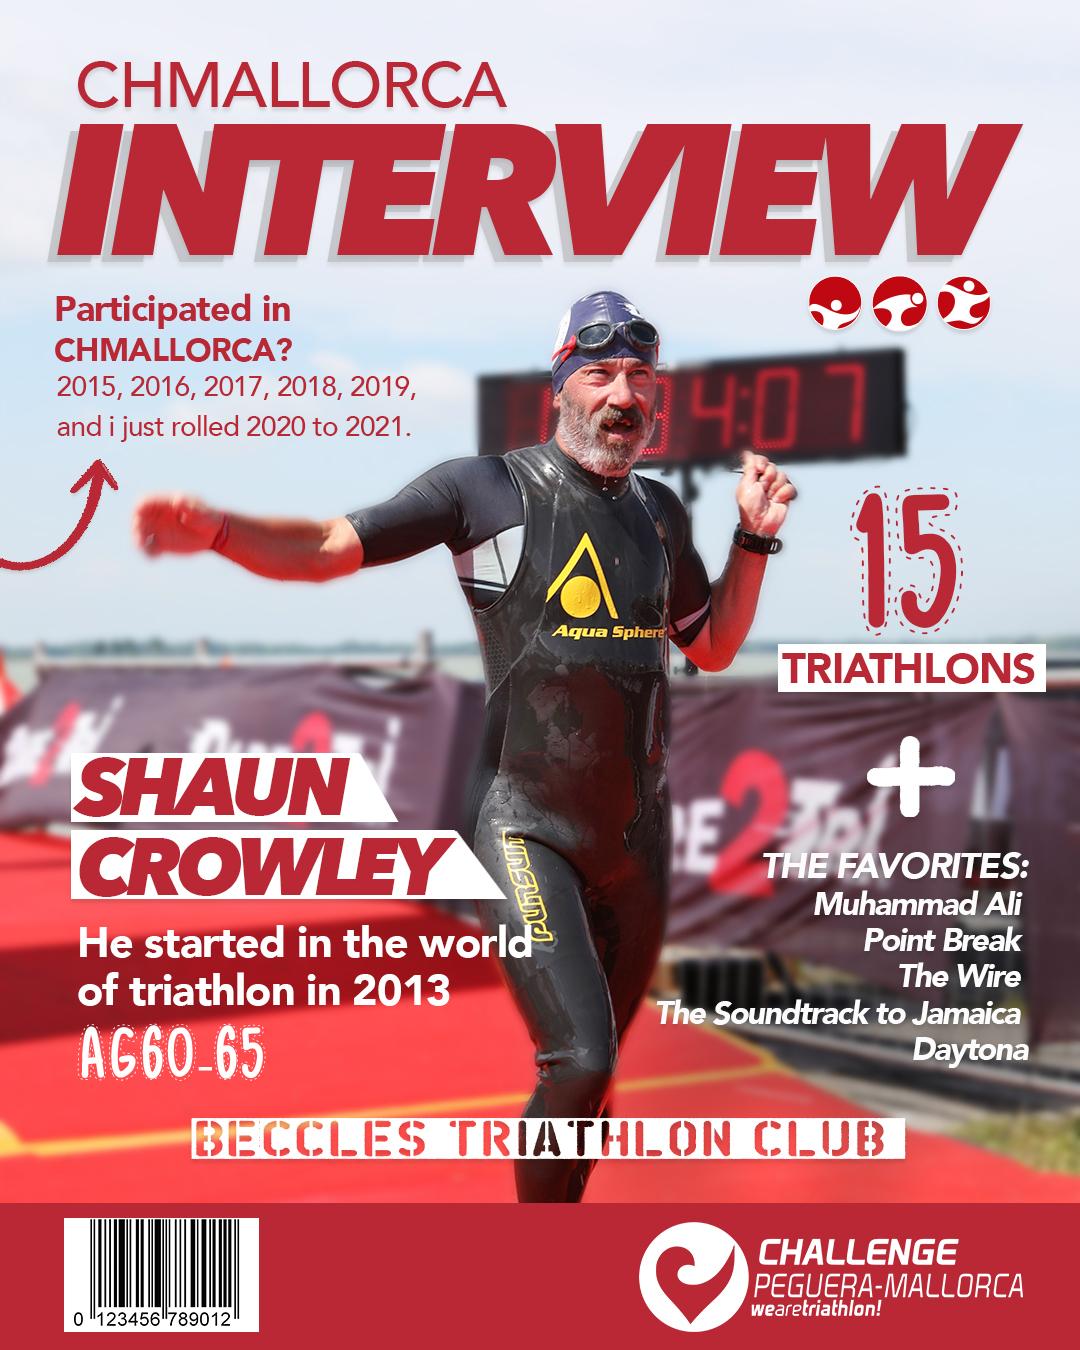 interview-shaun-crowley-ch